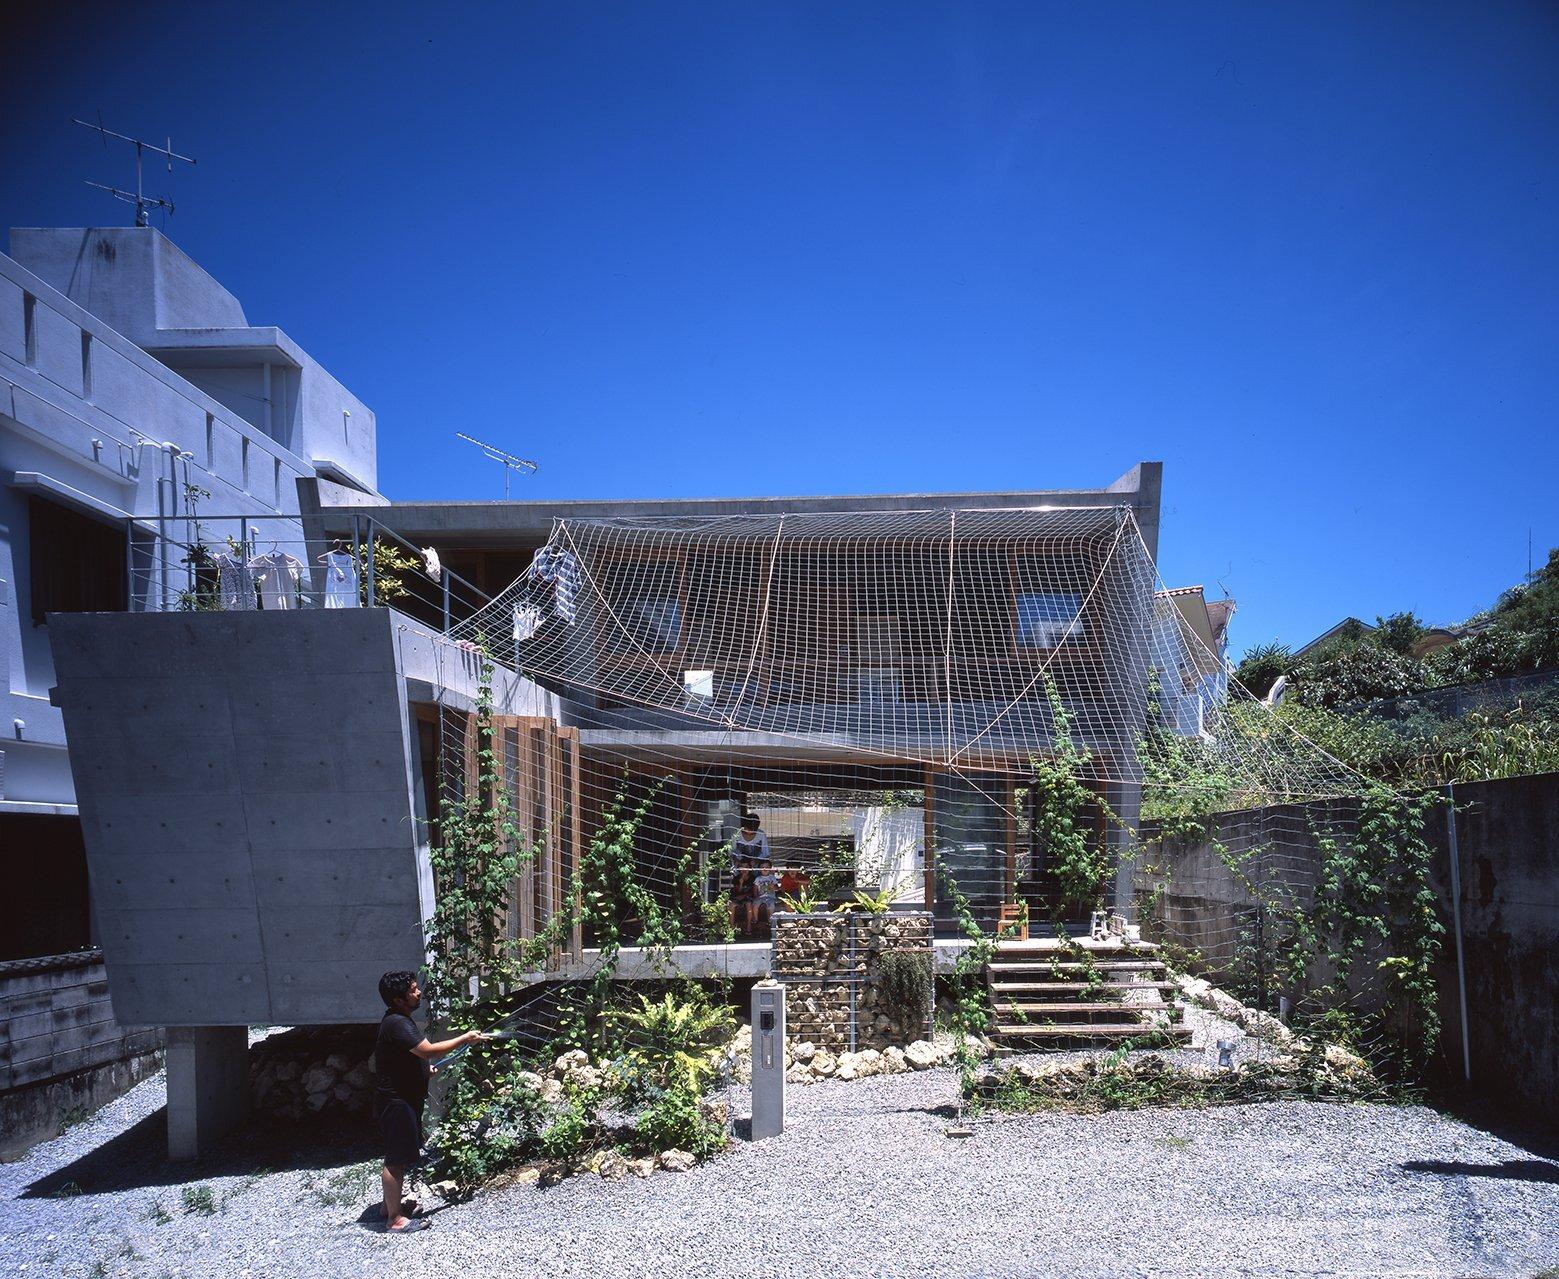 MA of Wind - Small Japanese House - Ryuichi Ashizawa Architect & Associates - Japan - Exterior - Humble Homes